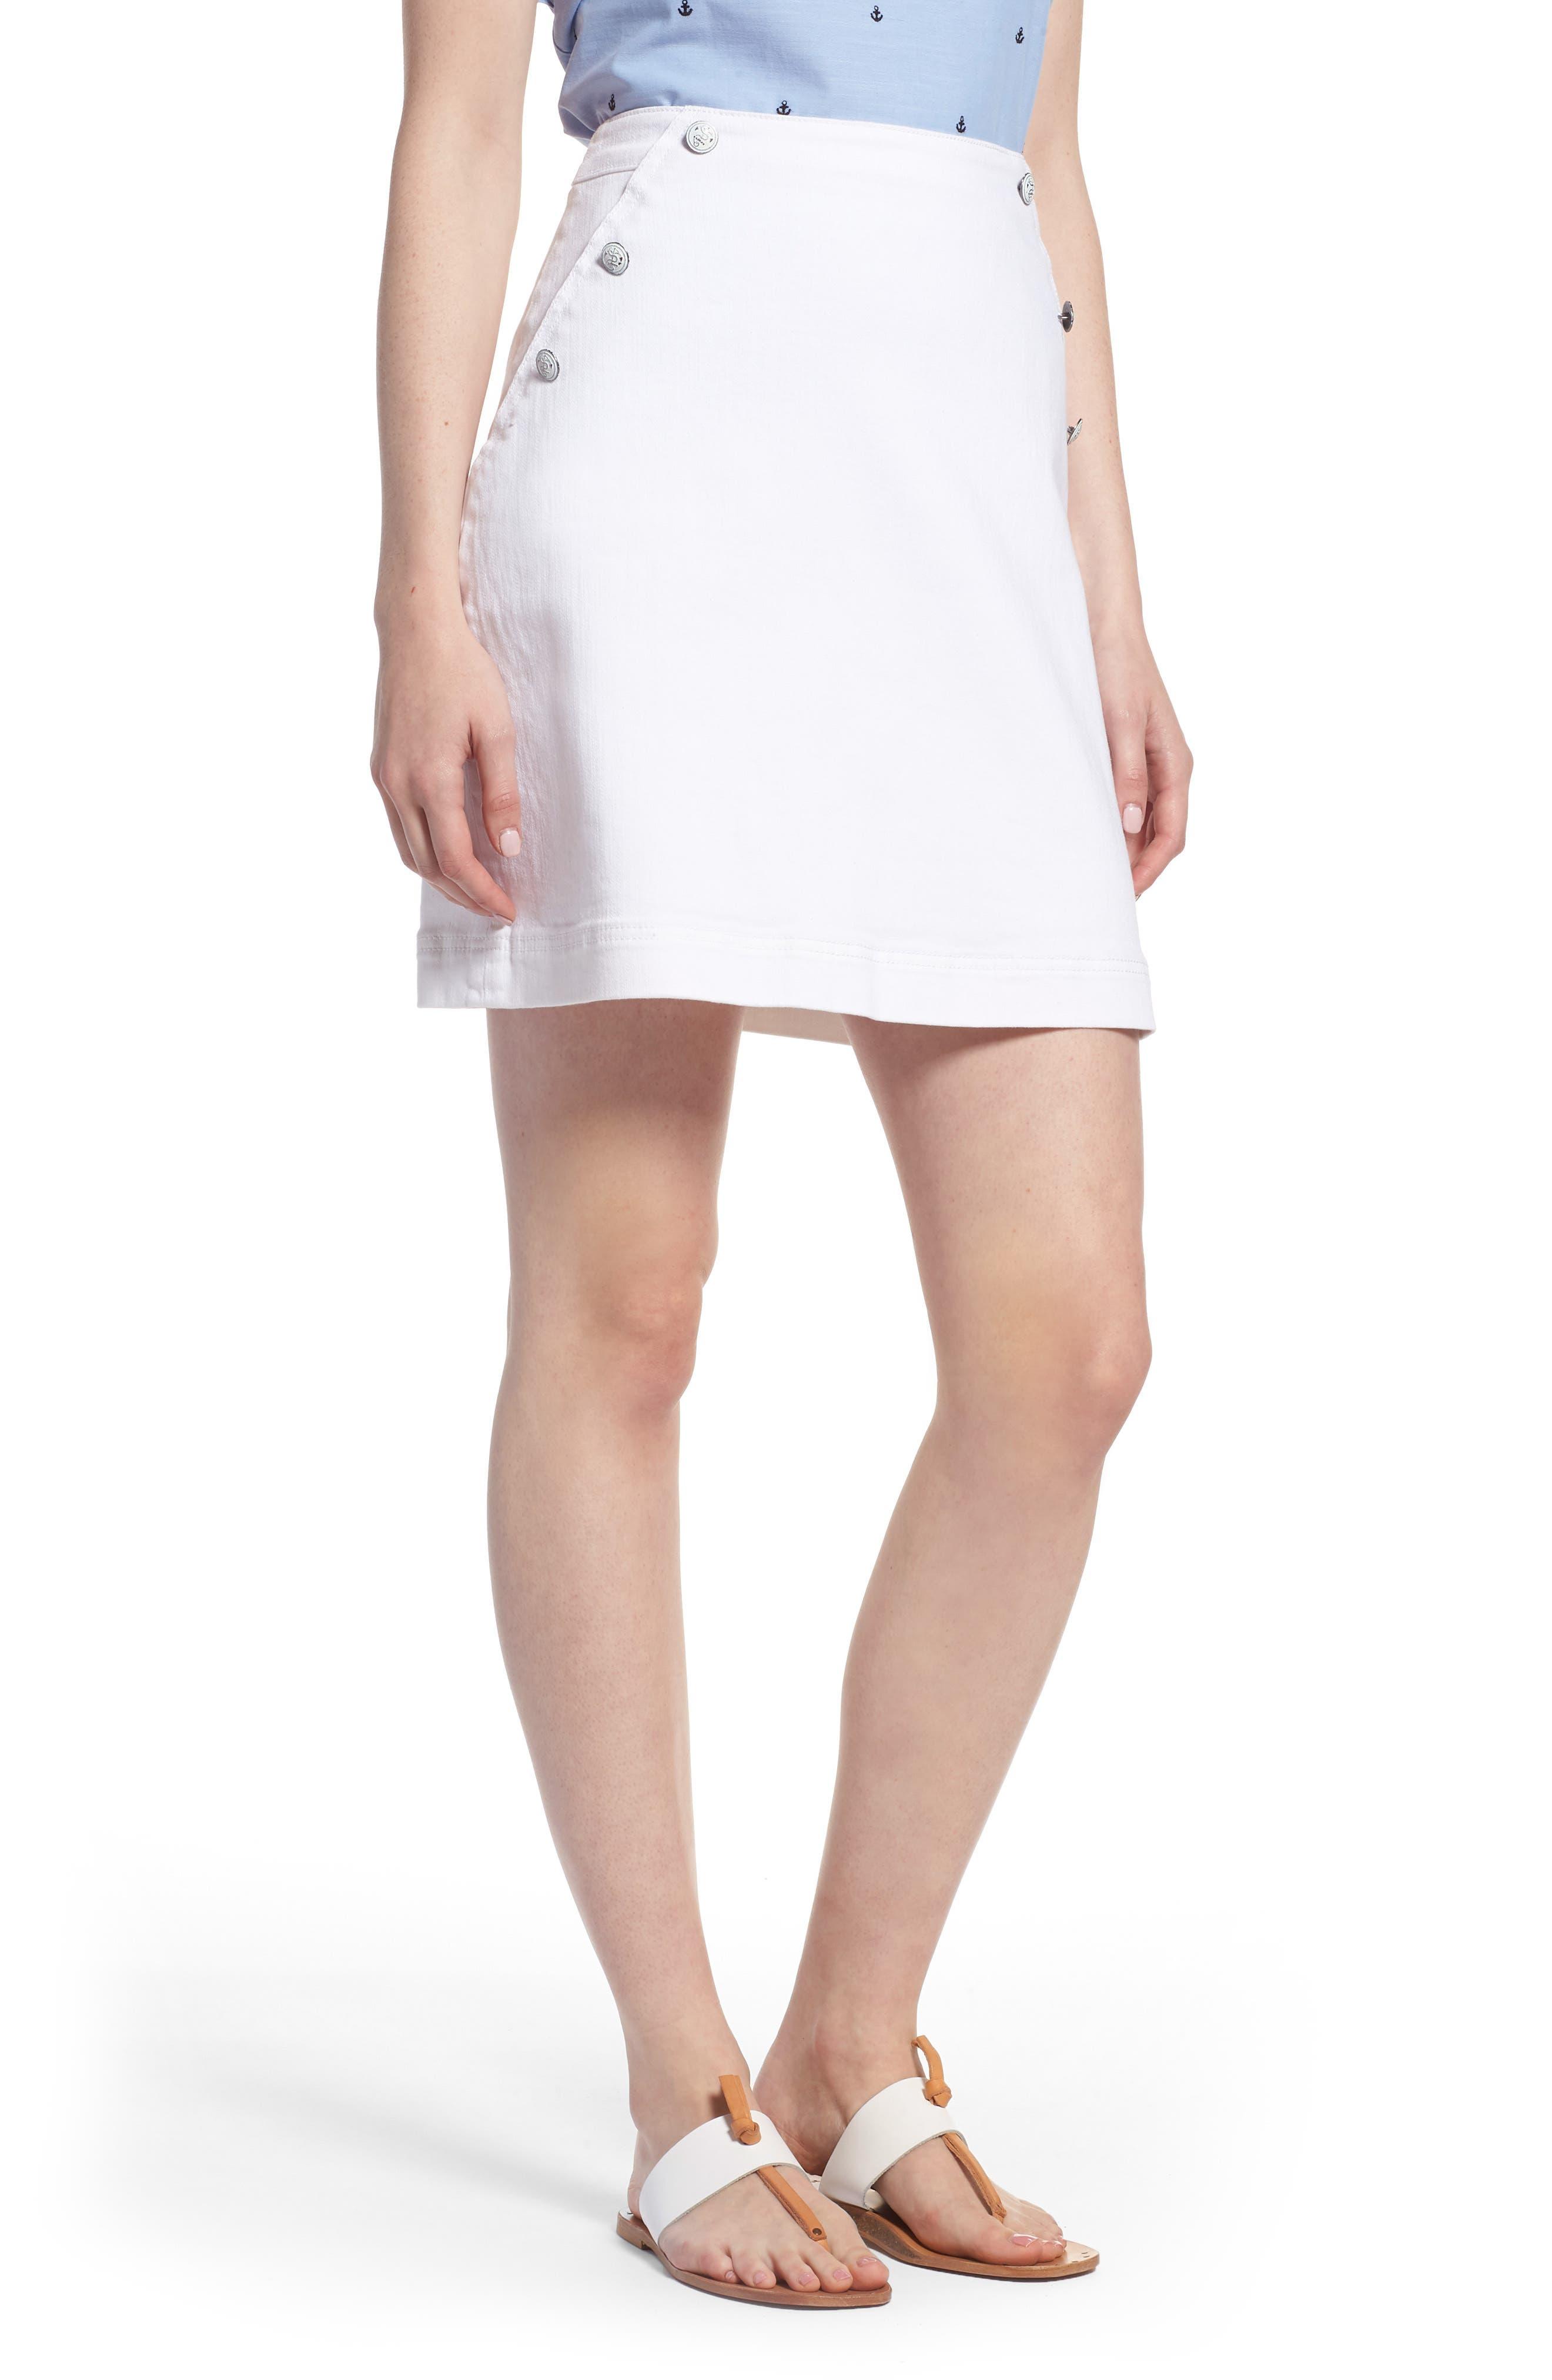 Sailor Button White Denim Skirt,                             Main thumbnail 1, color,                             White